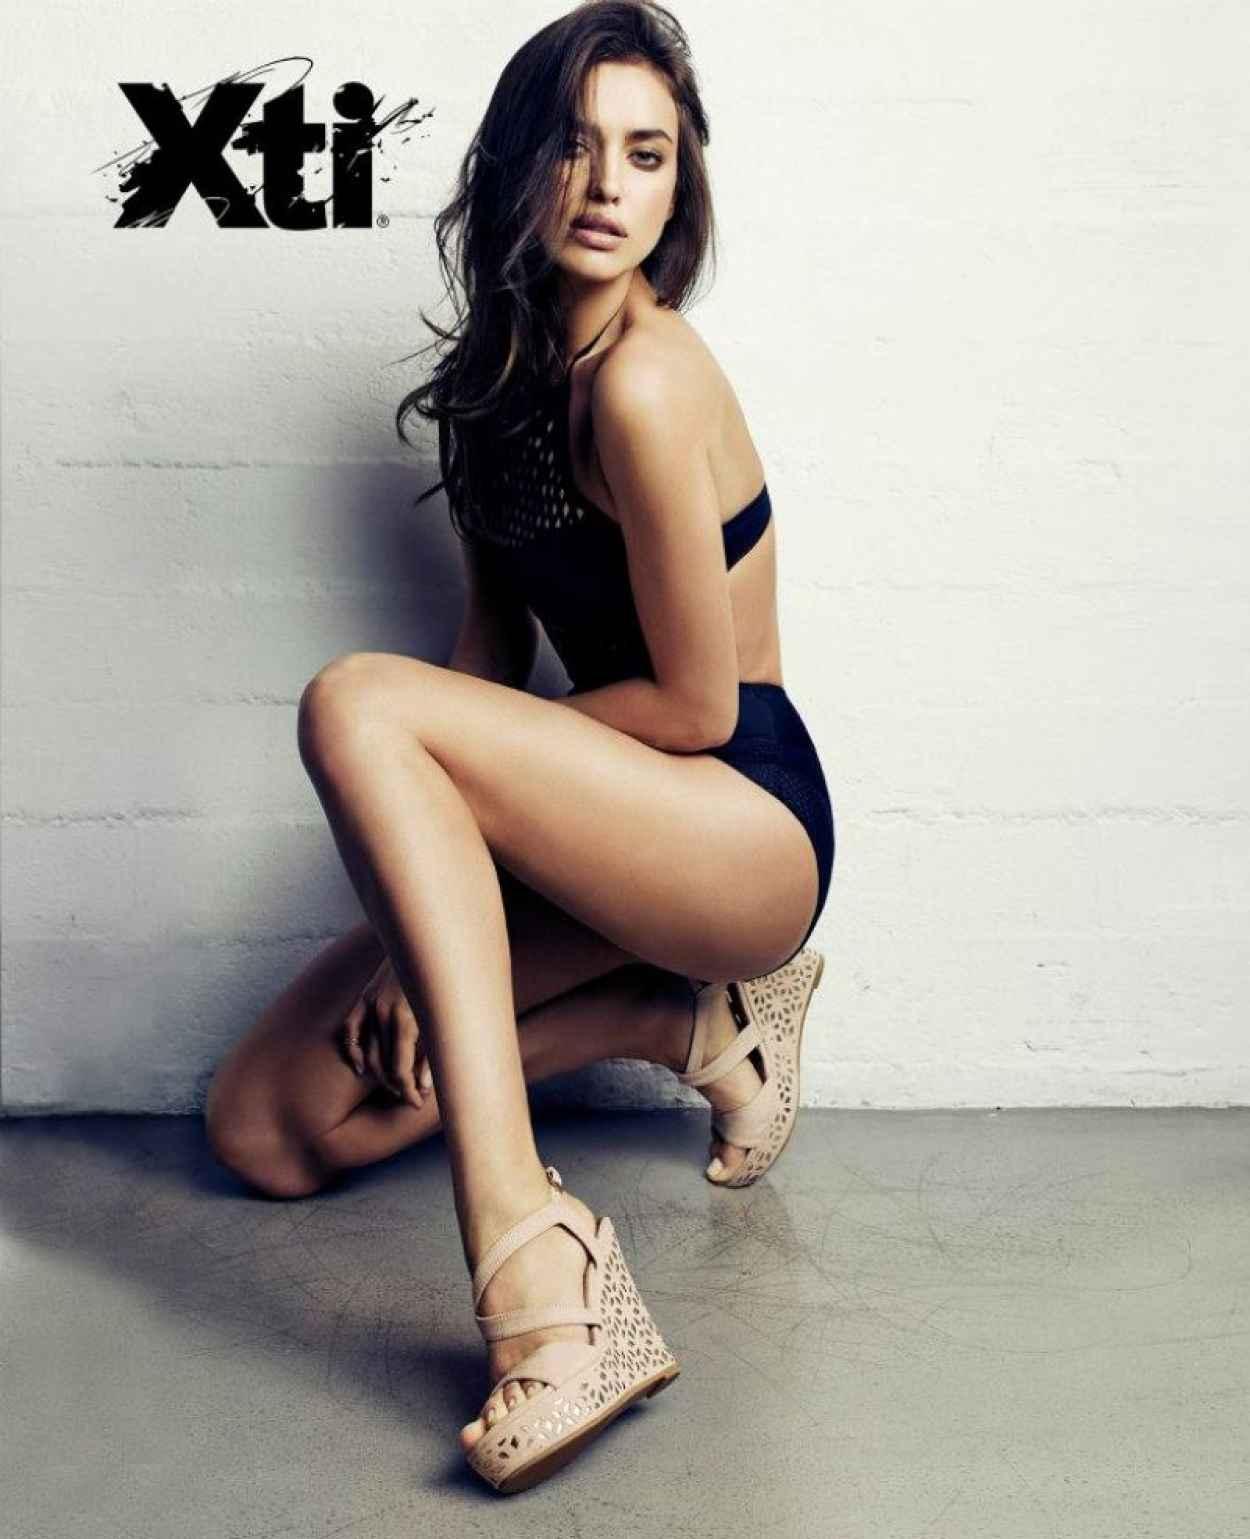 Irina Shayk Hot Photoshoot - XTI Spring/Summer 2015 Photoshoot-1